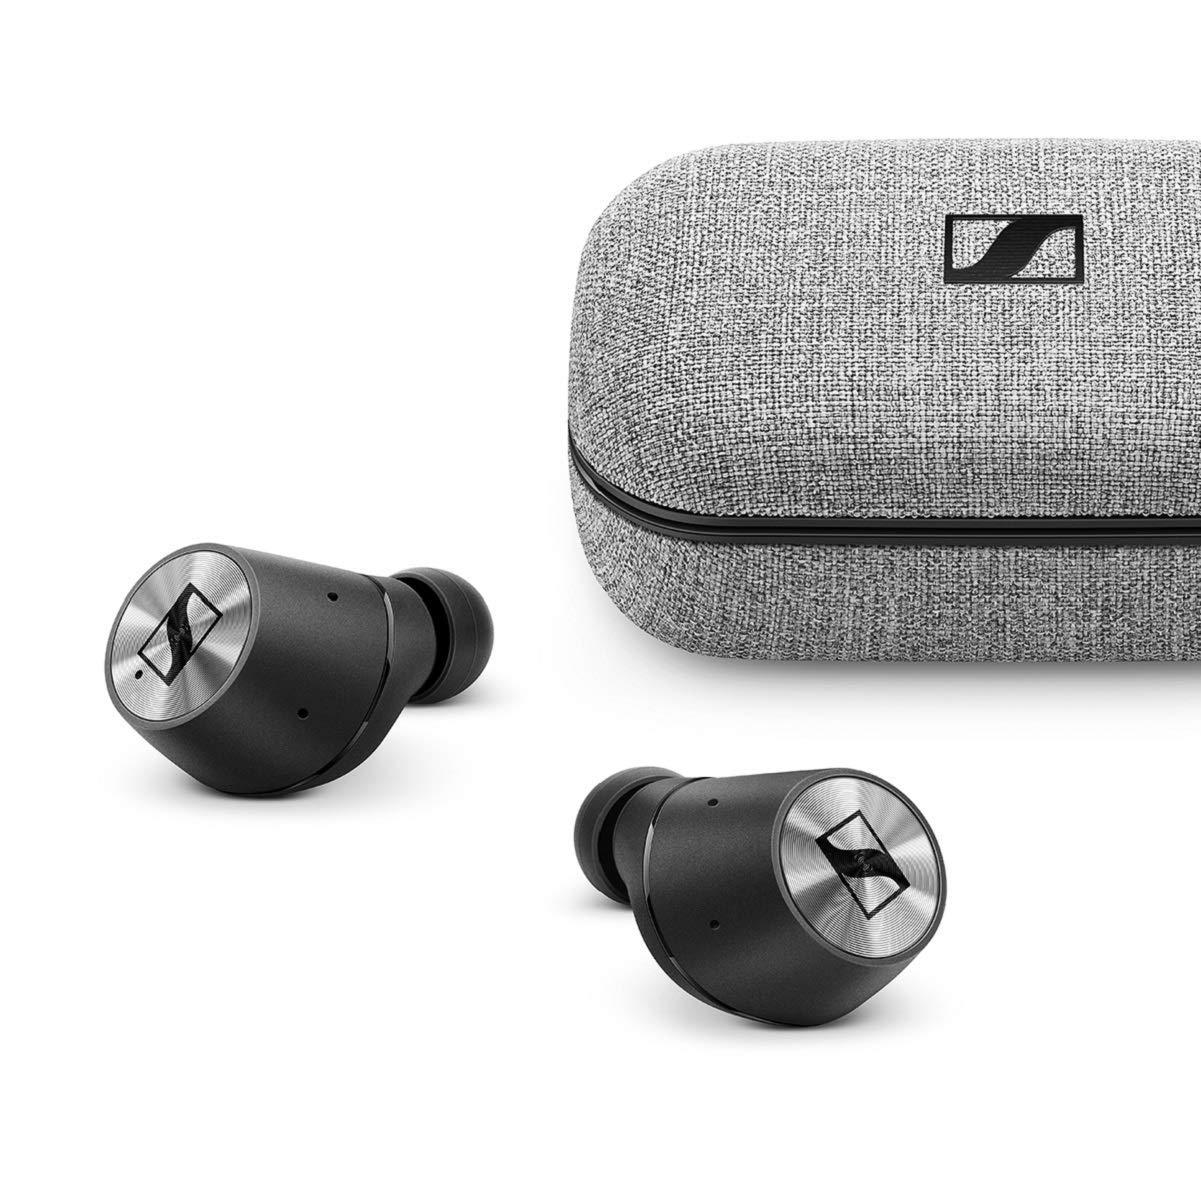 Sennheiser MOMENTUM True Wireless In-Ear Headphones - £219 @ Amazon